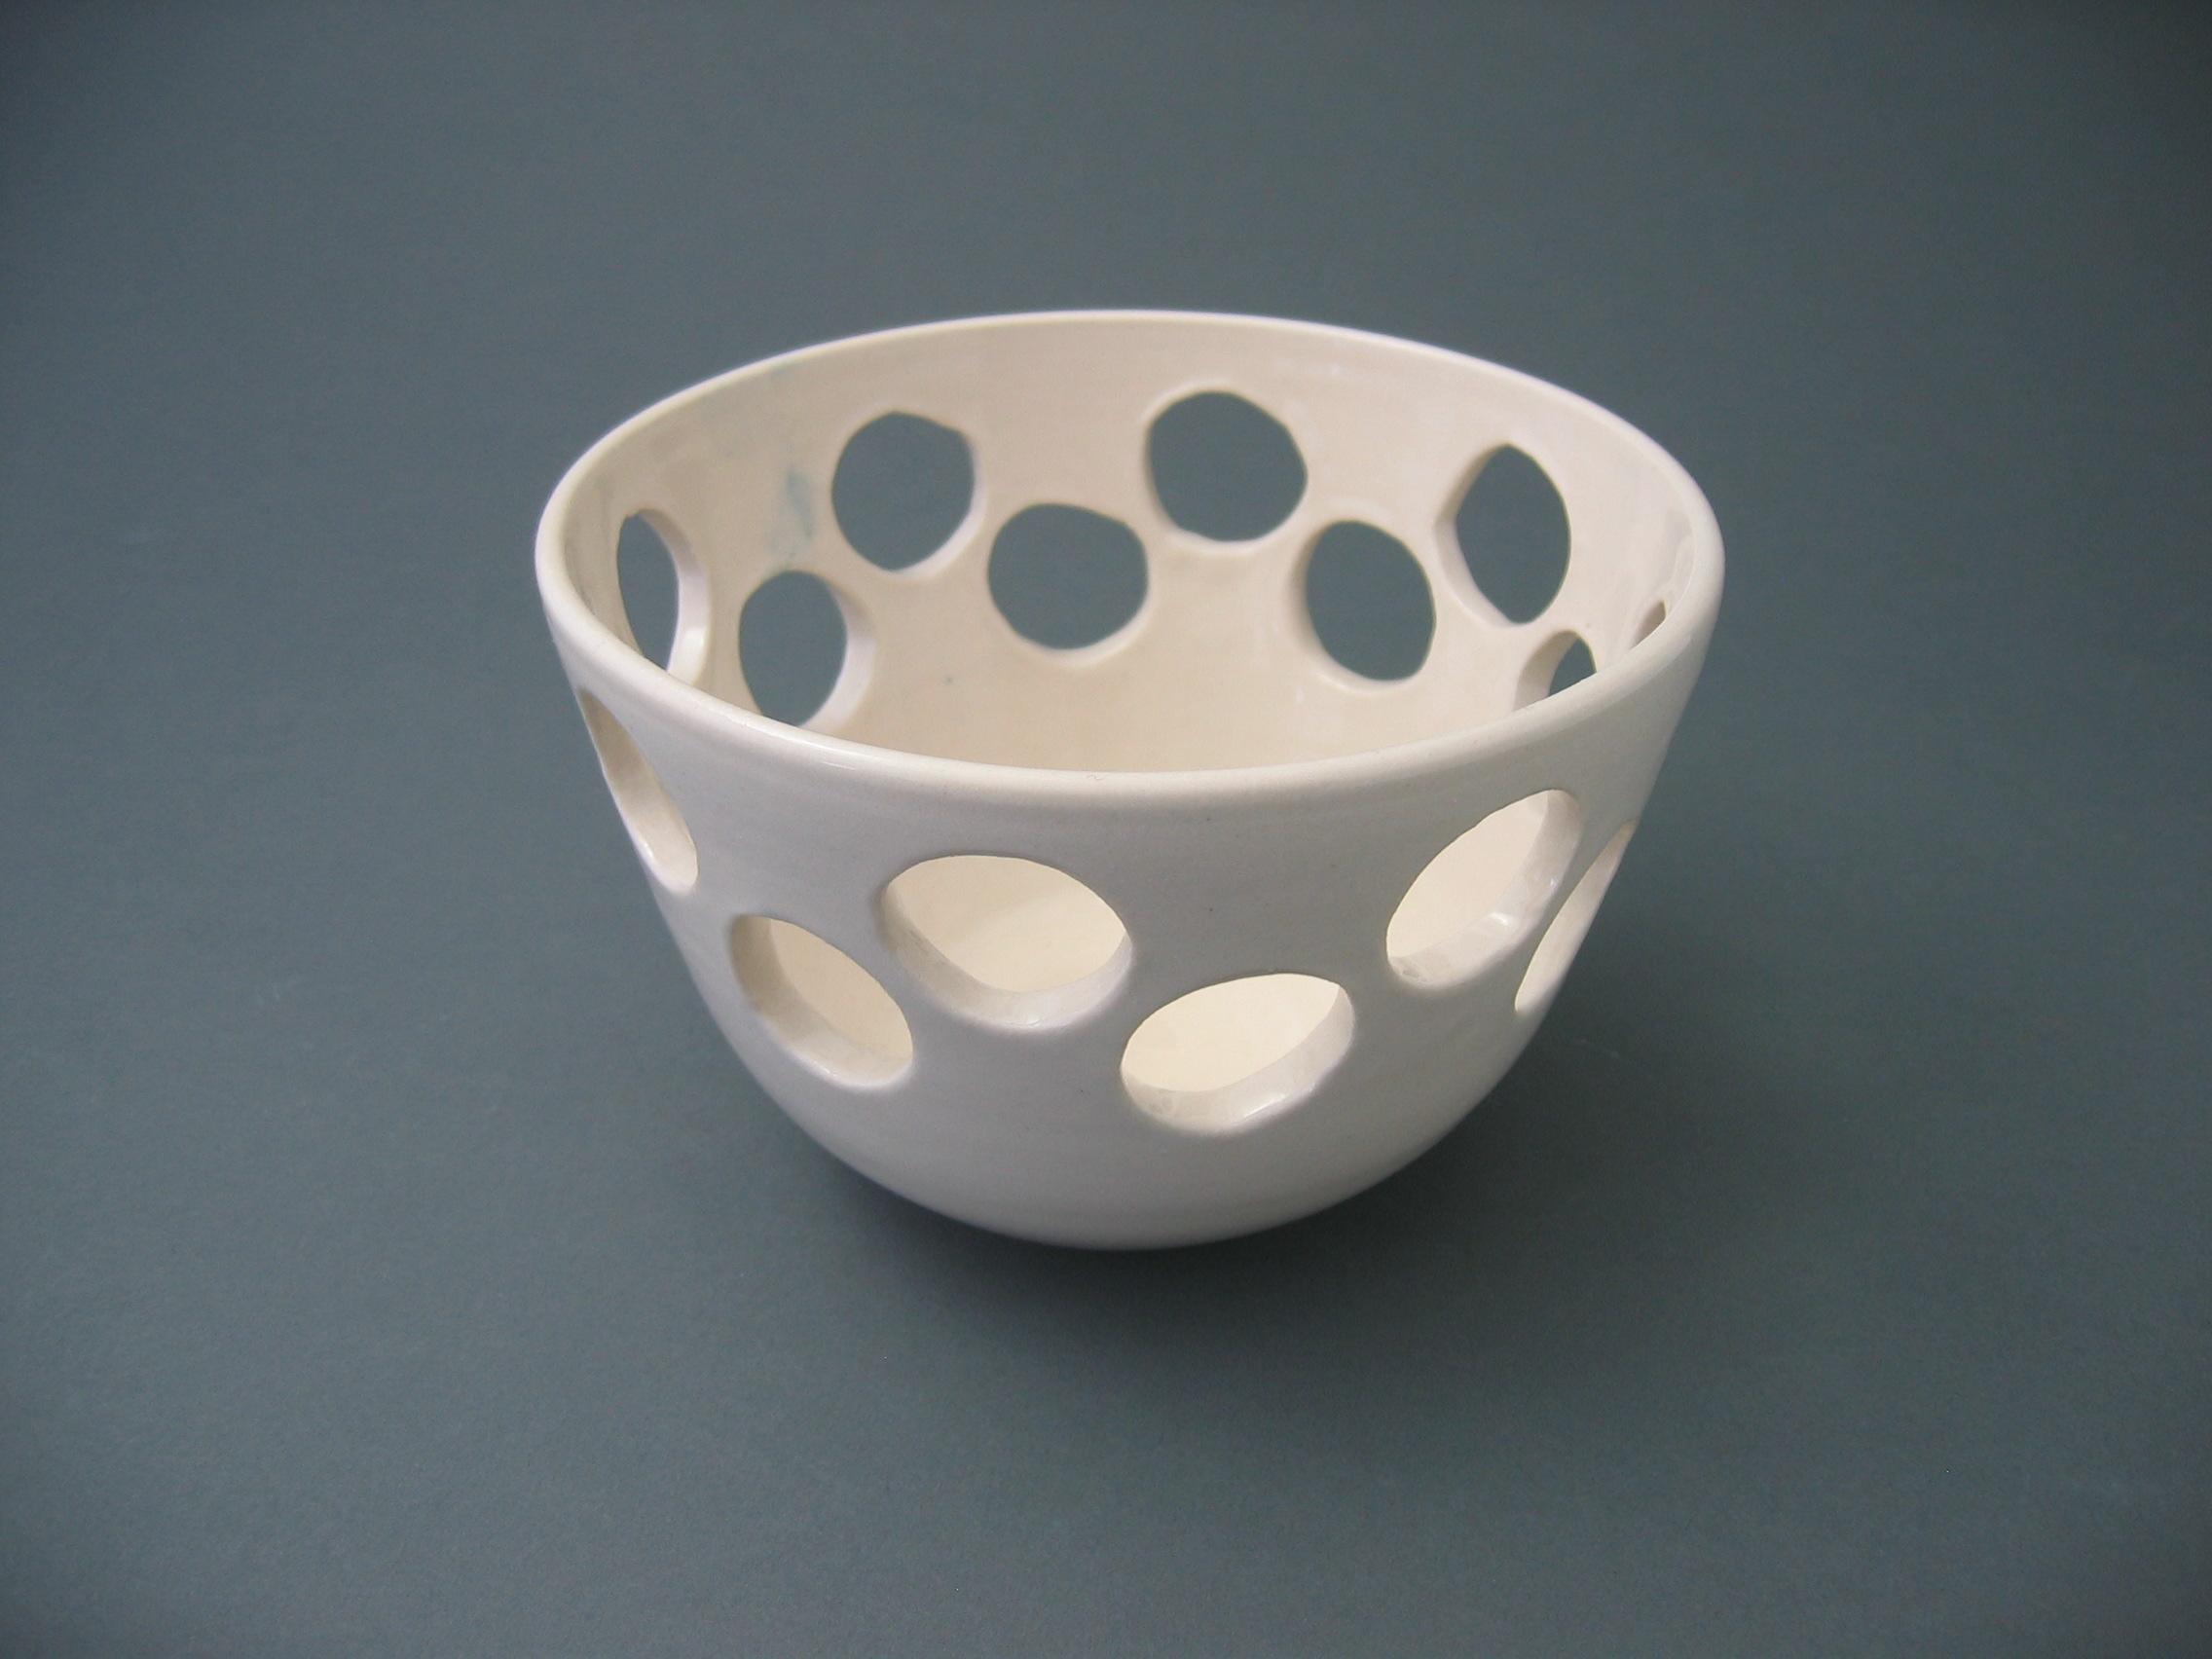 Holey bowl